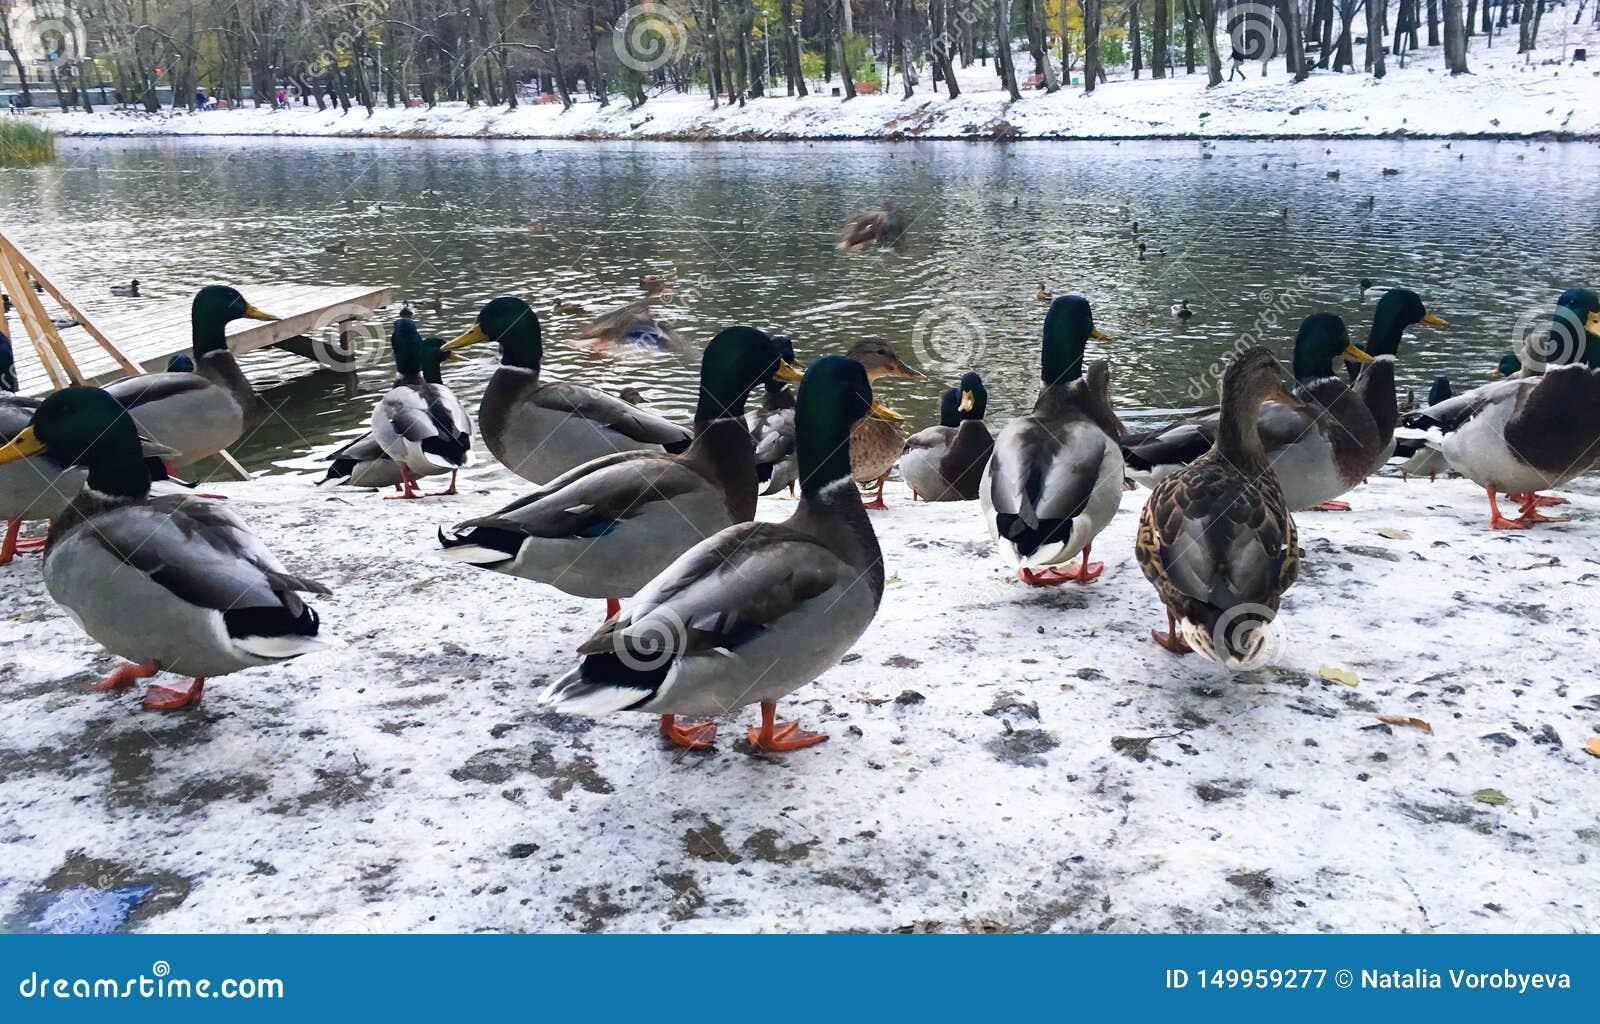 Patos no rio do inverno, wintering na cidade